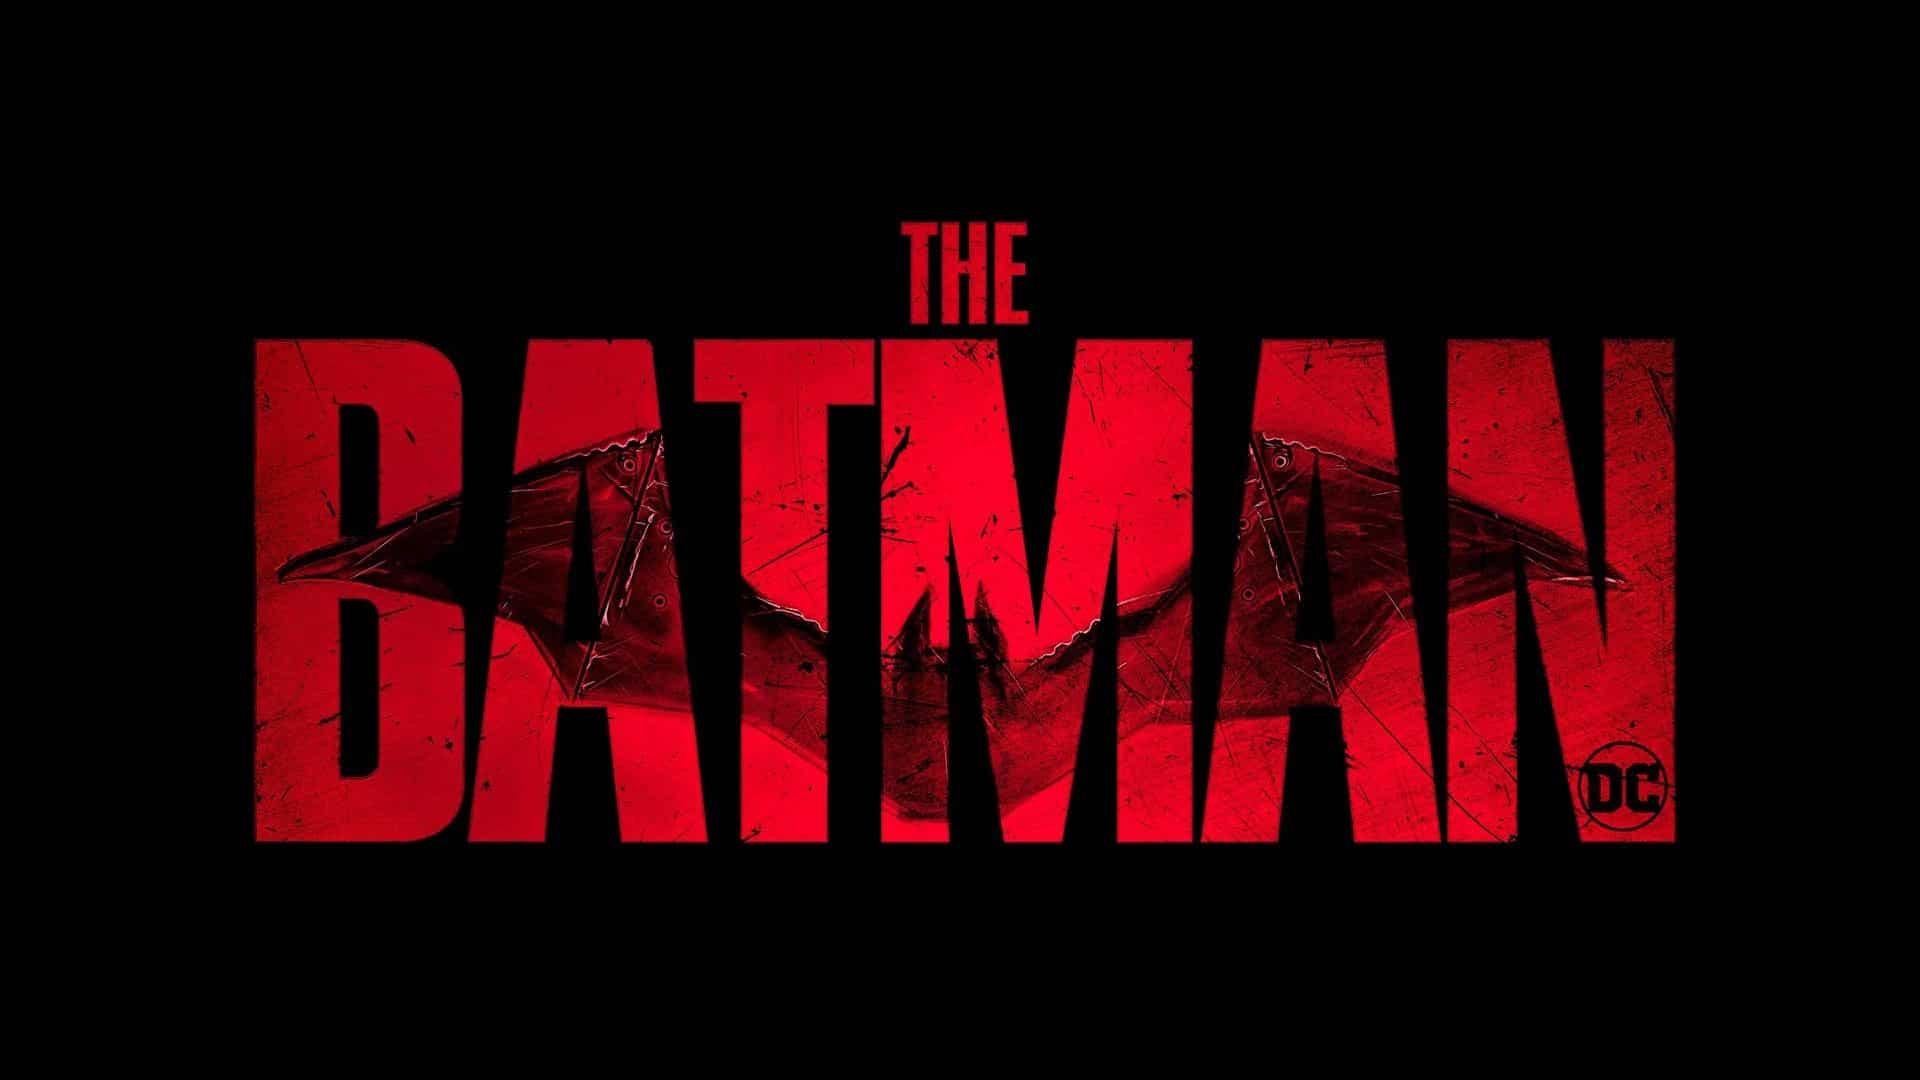 The Batman Matt Reeves Movie Delay